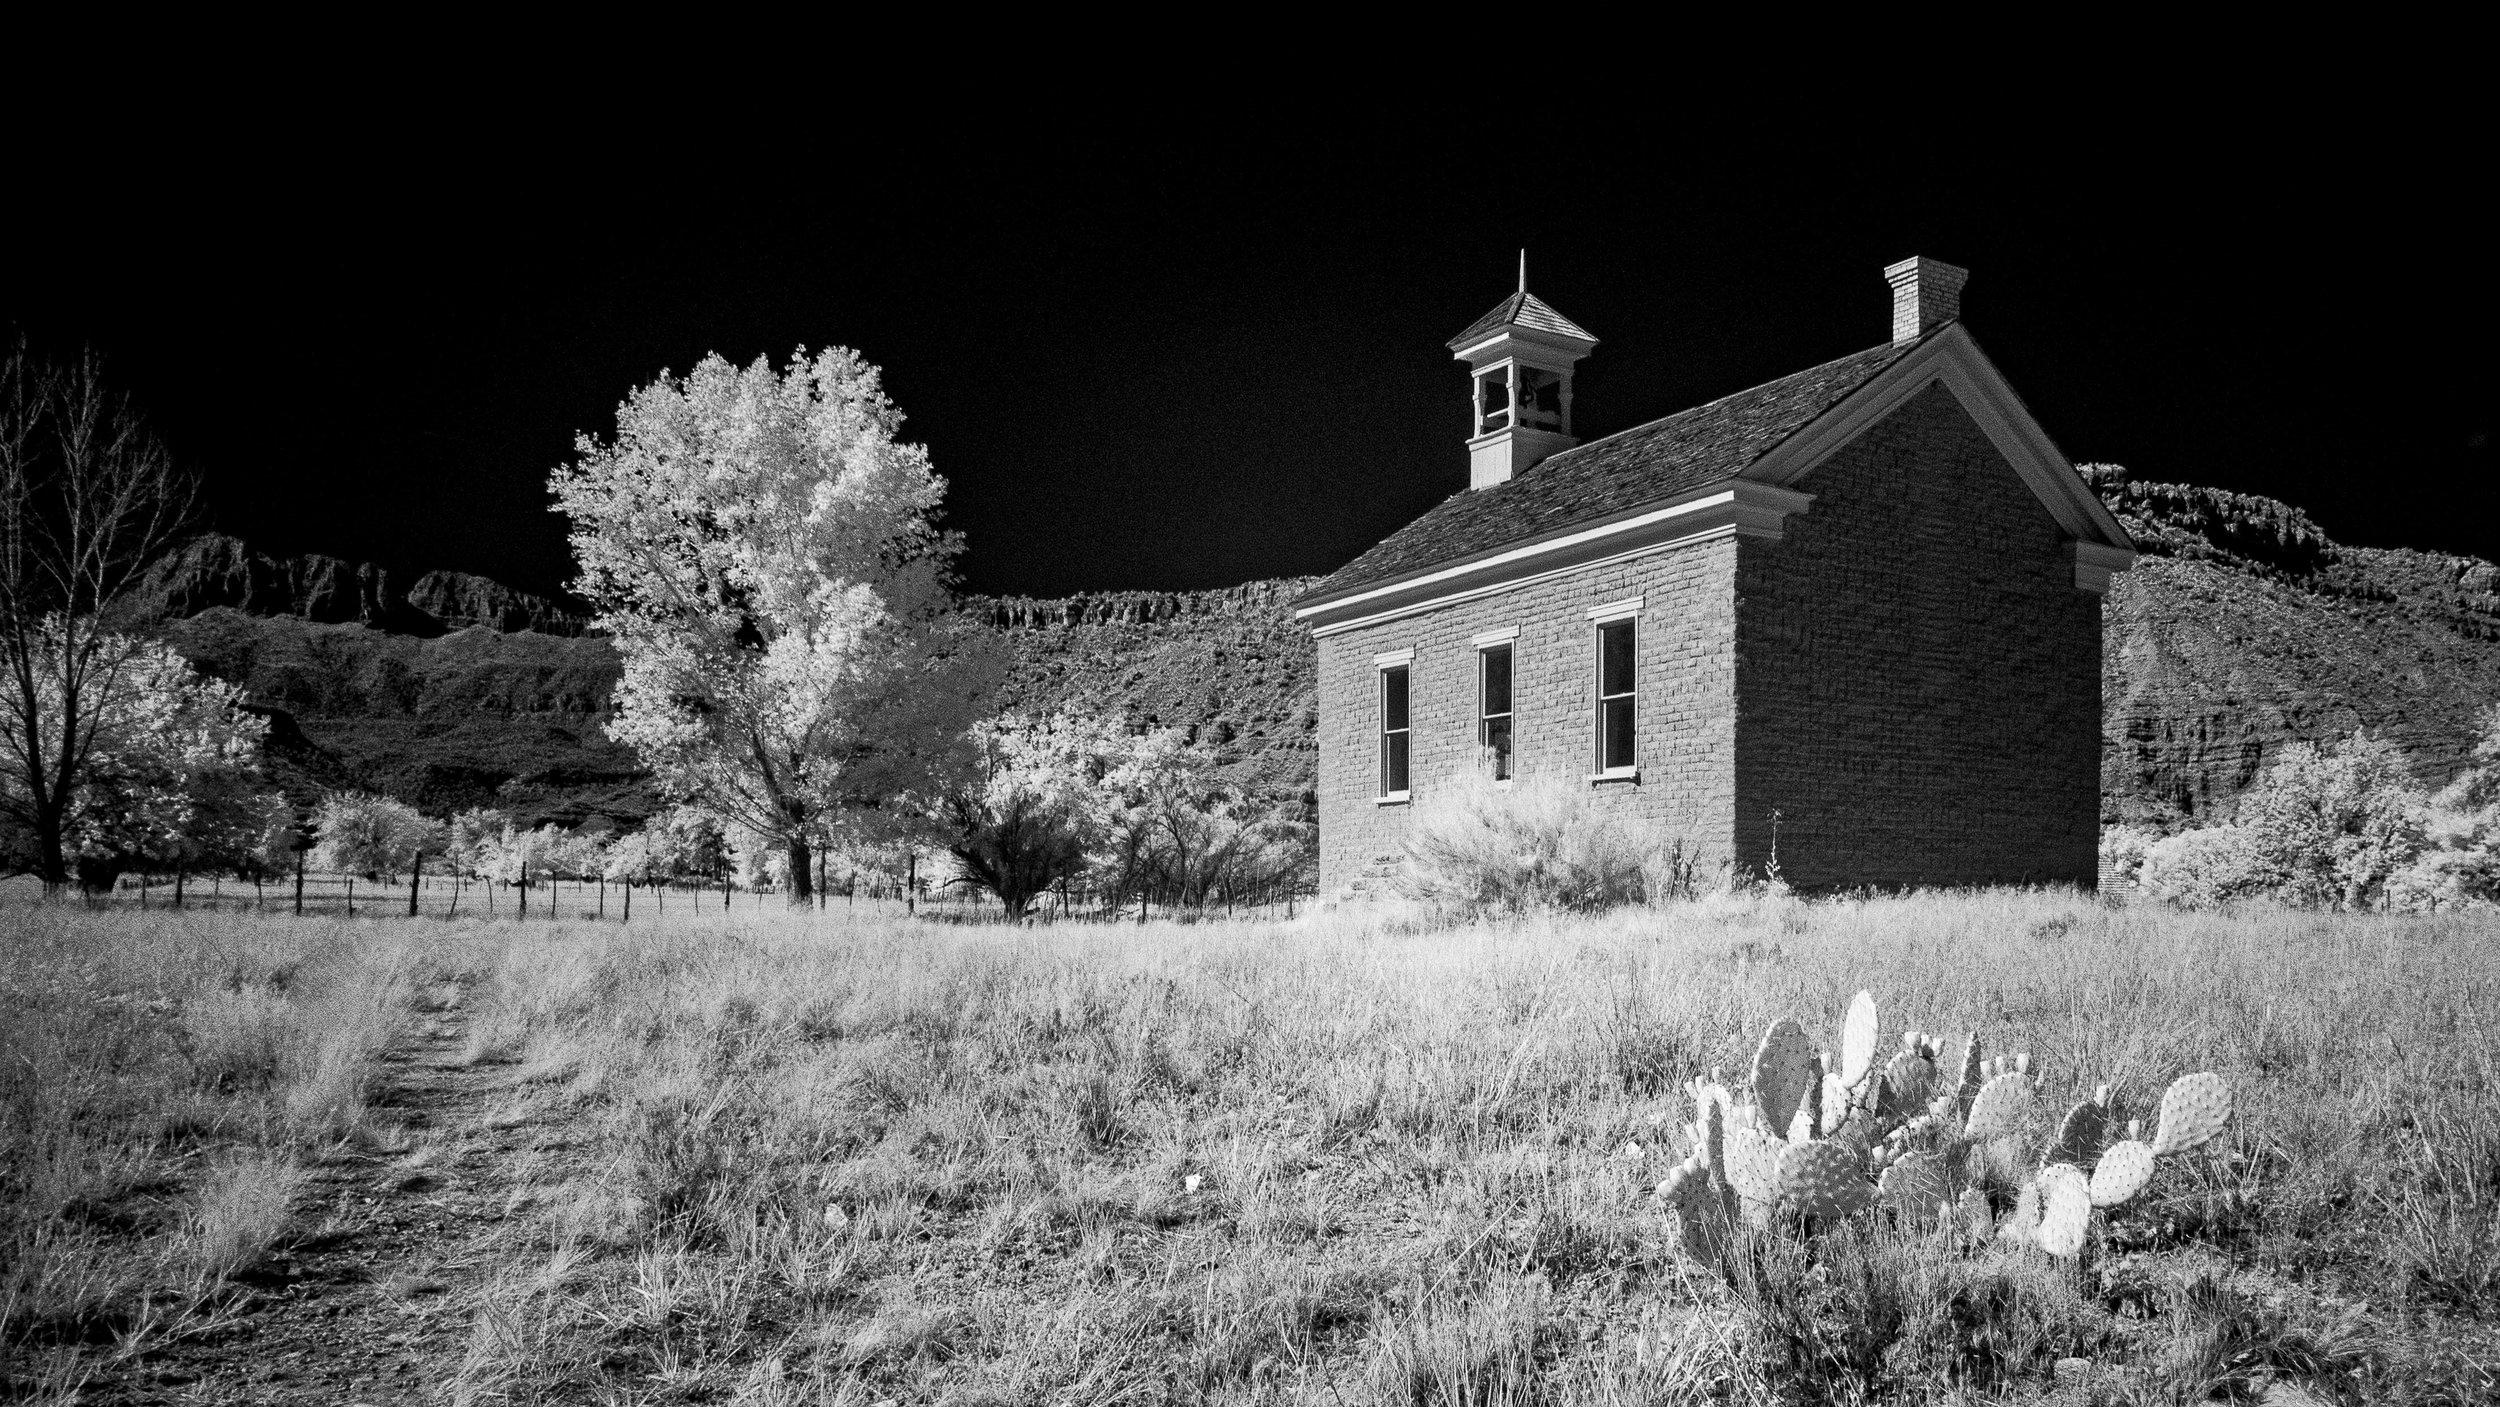 P1010034PS__PSD Glossy Sharpened_Grafton, Utah- The Abandoned Church.jpg